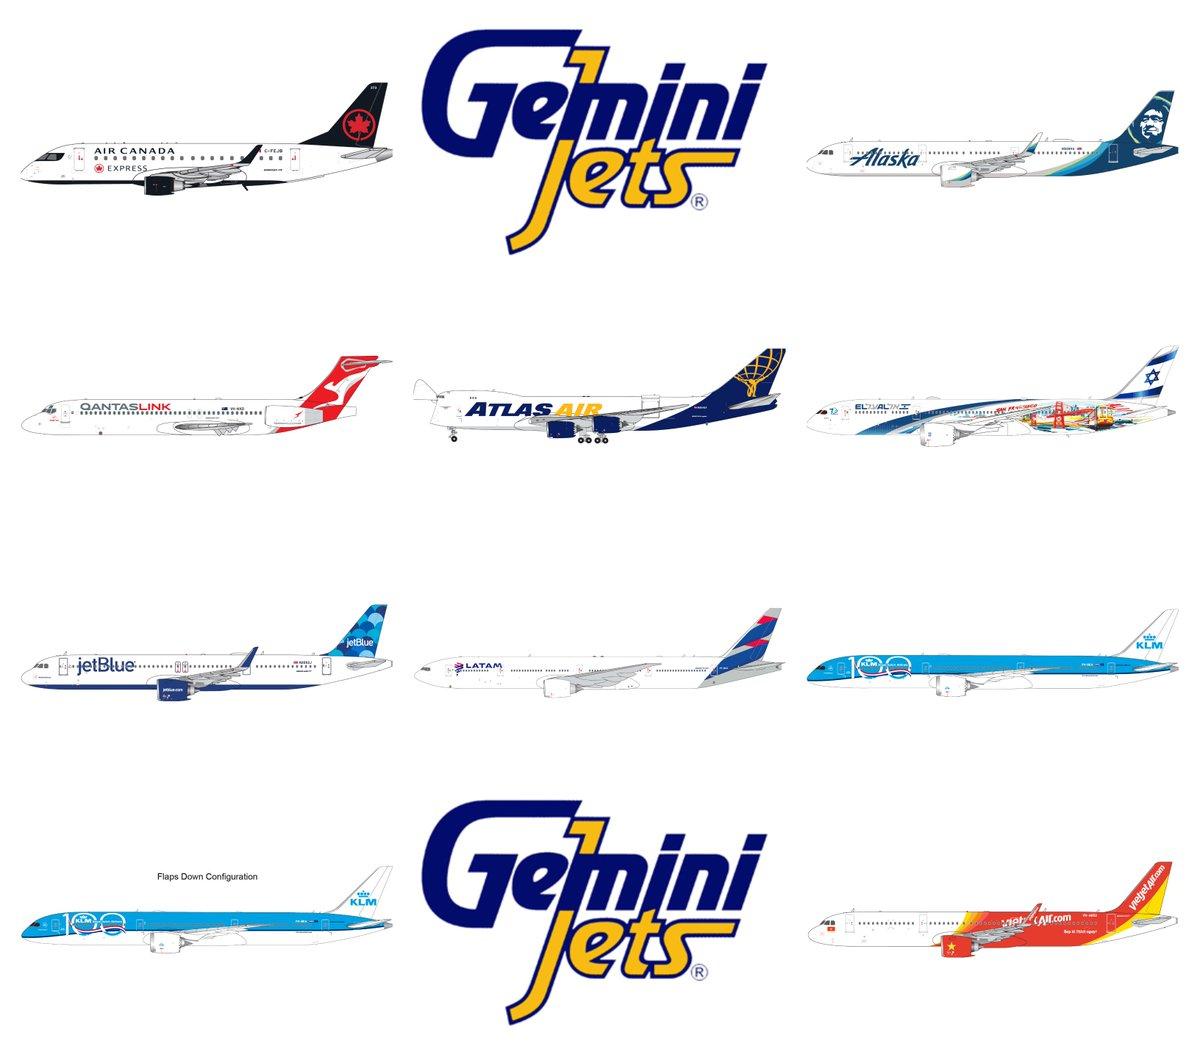 NEW 1:400 AEROCLASSICS JETBLUE AIRWAYS AIRBUS A320-200 Model ACN633JB